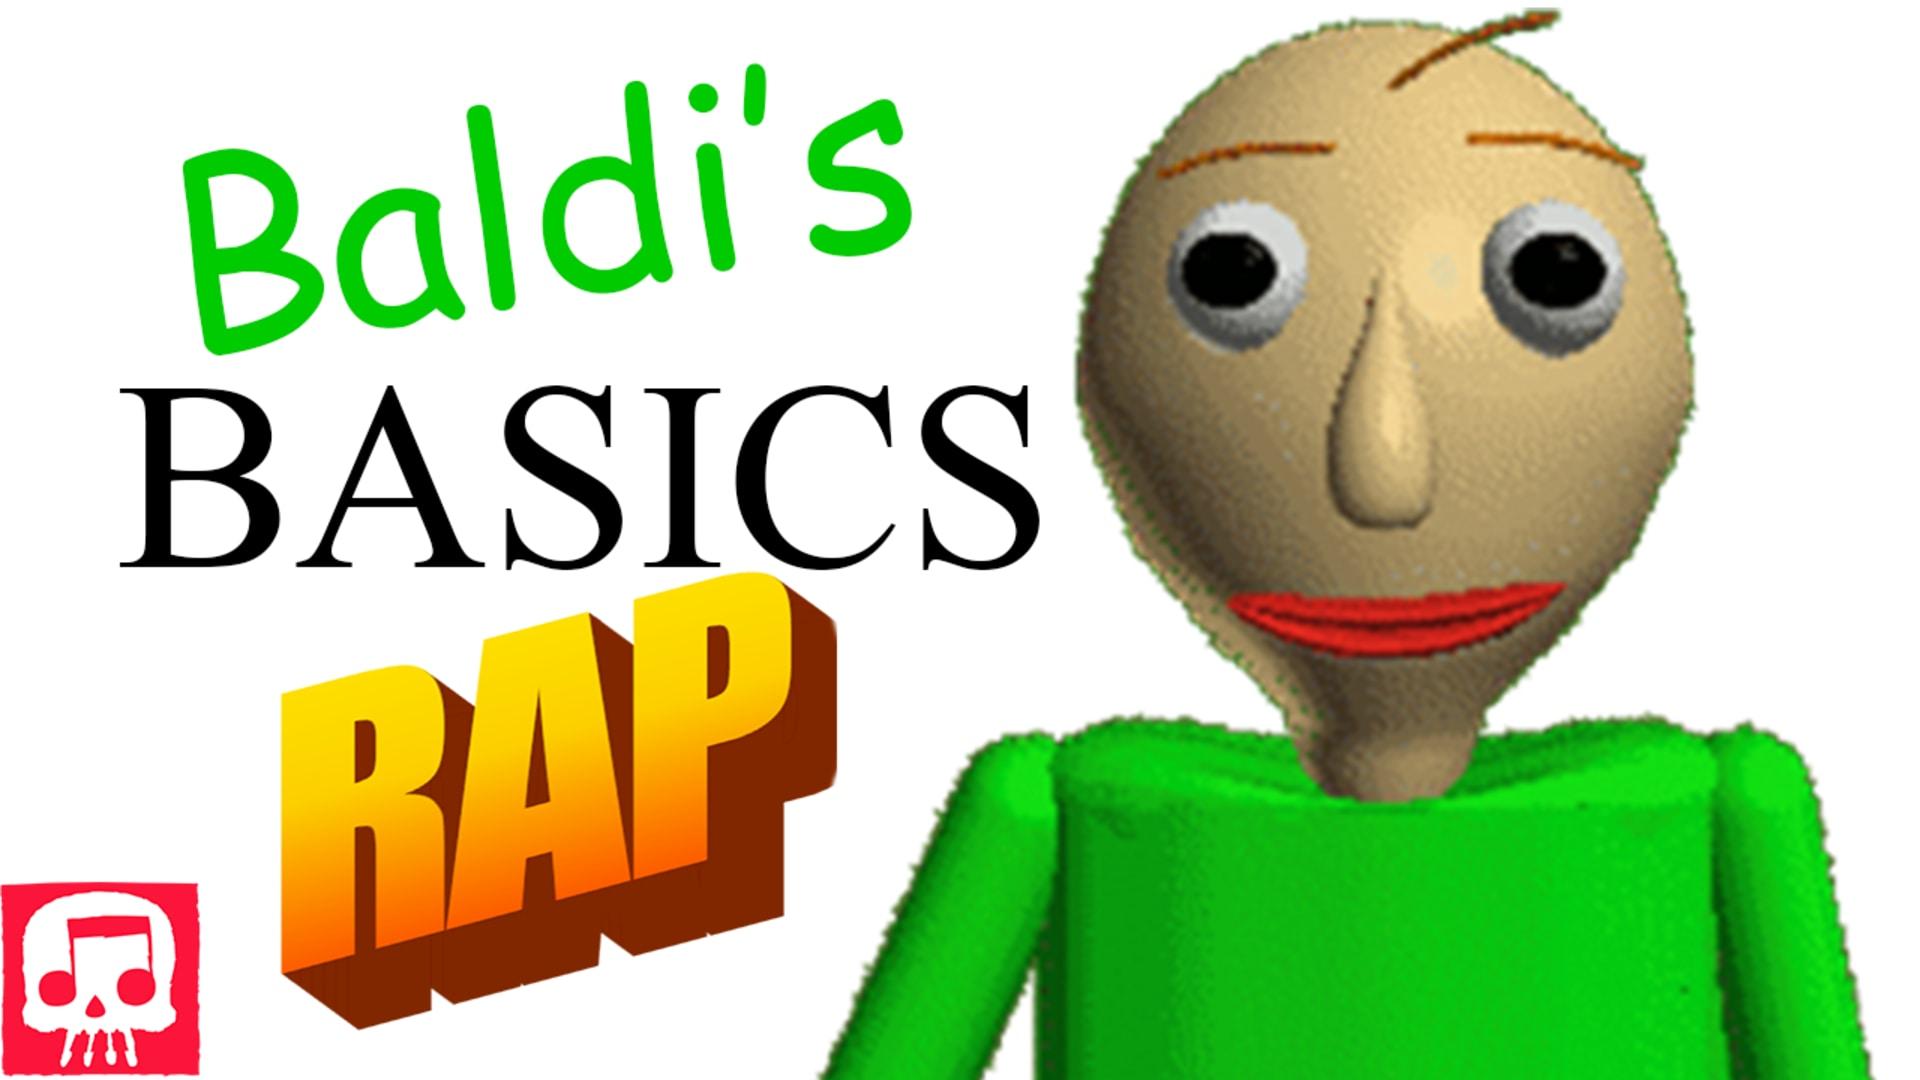 Baldi's Basics Rap - Rooster Teeth